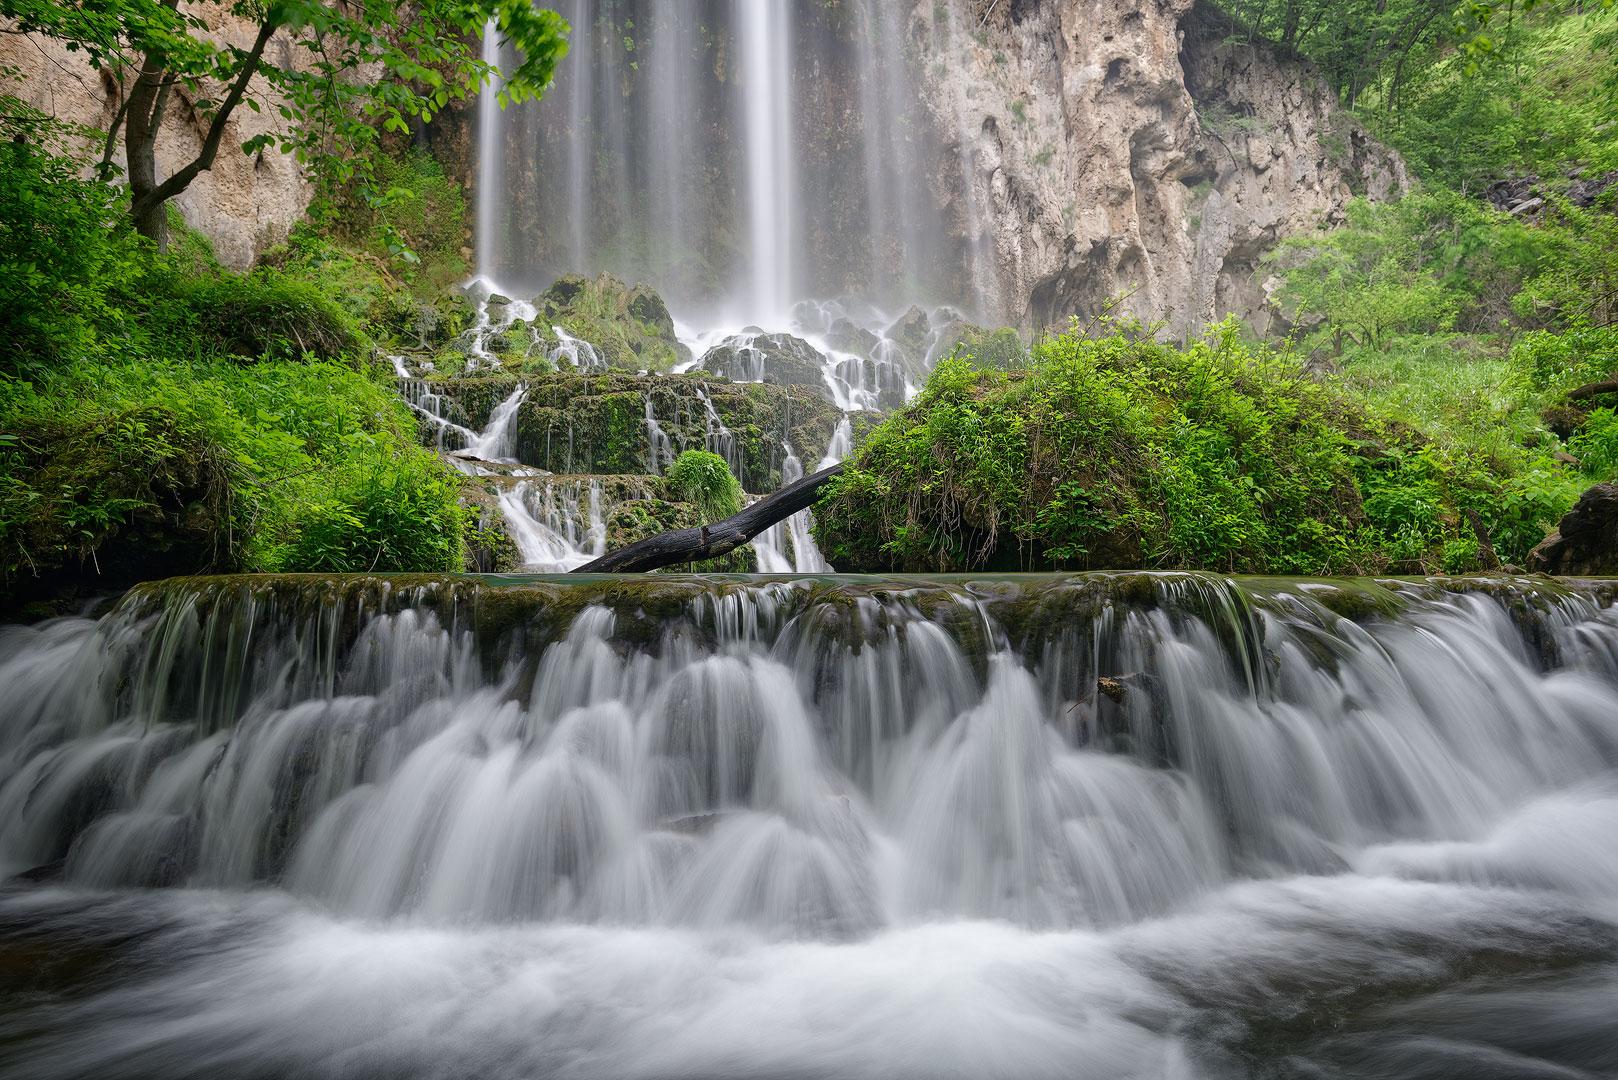 Virginia, Waterfall, Falling Springs Falls, Western Virginia, Spring, Mountain, Landscape, Stream, Cascades, photo